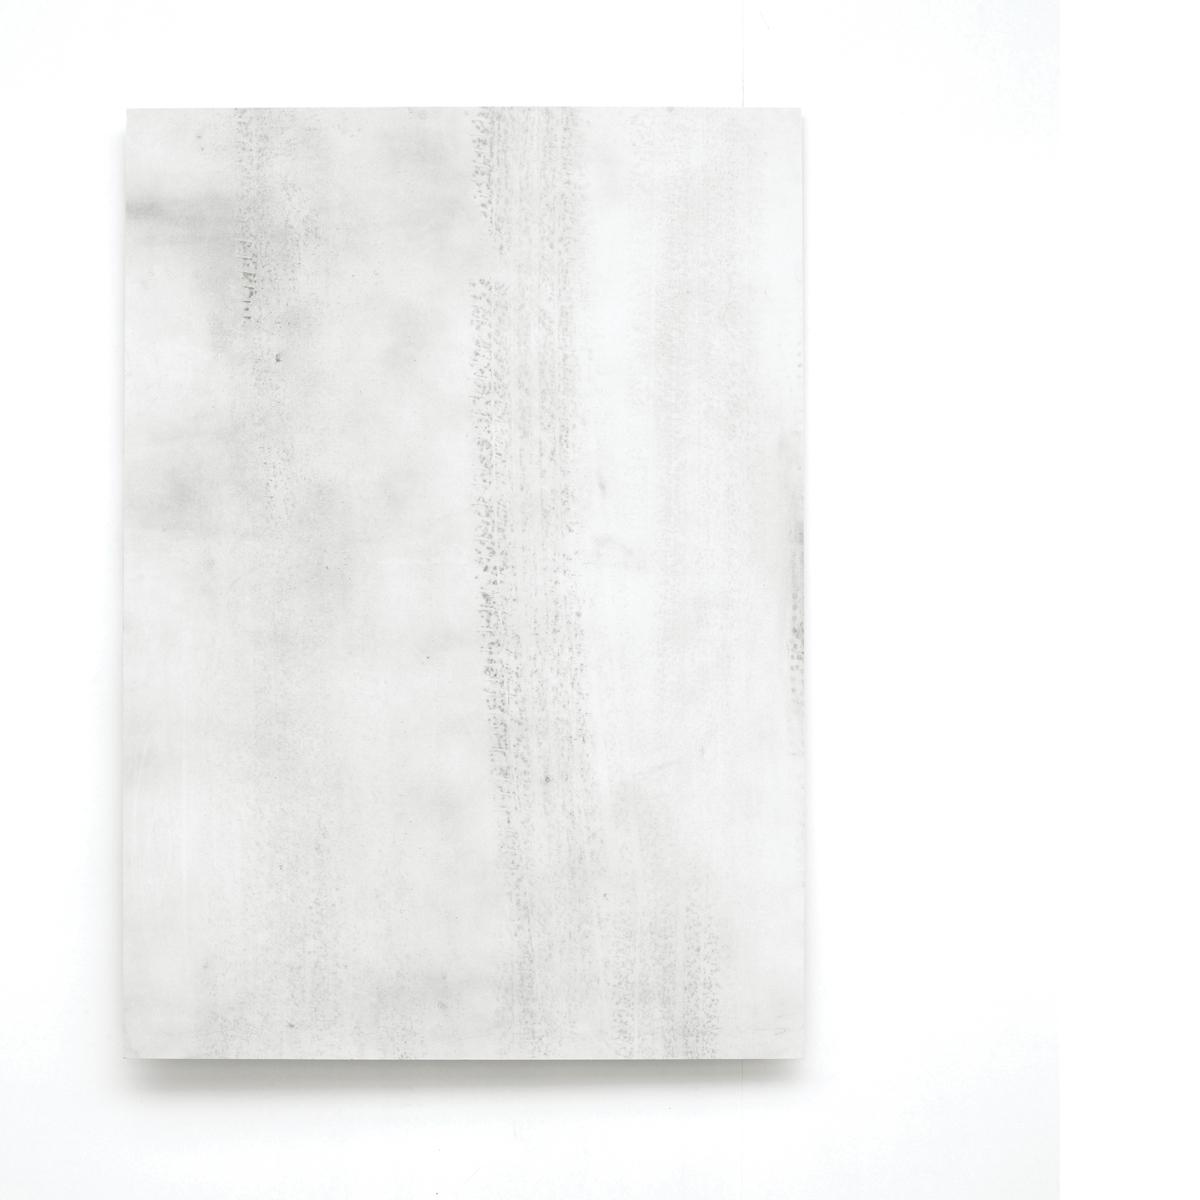 KOZAKIS - TireTrack#1_144x102cm_BETER?